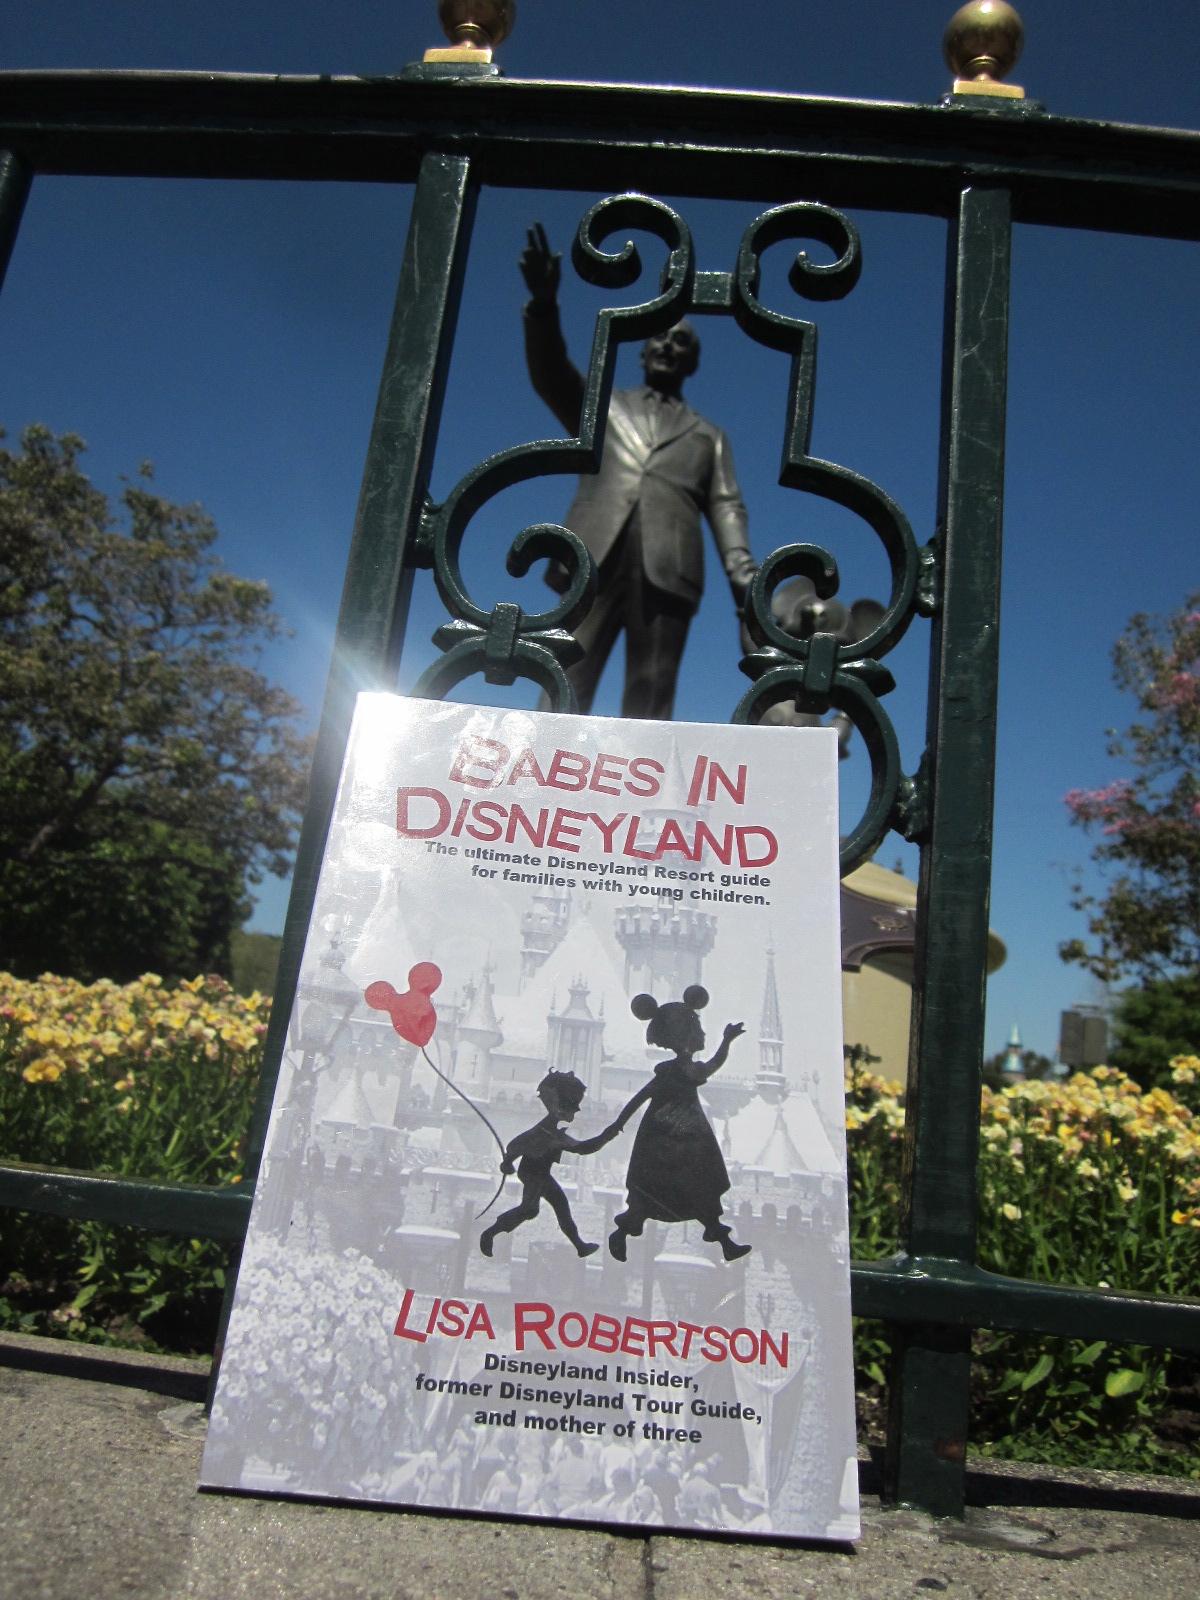 Babes in Disneyland Book Giveaway